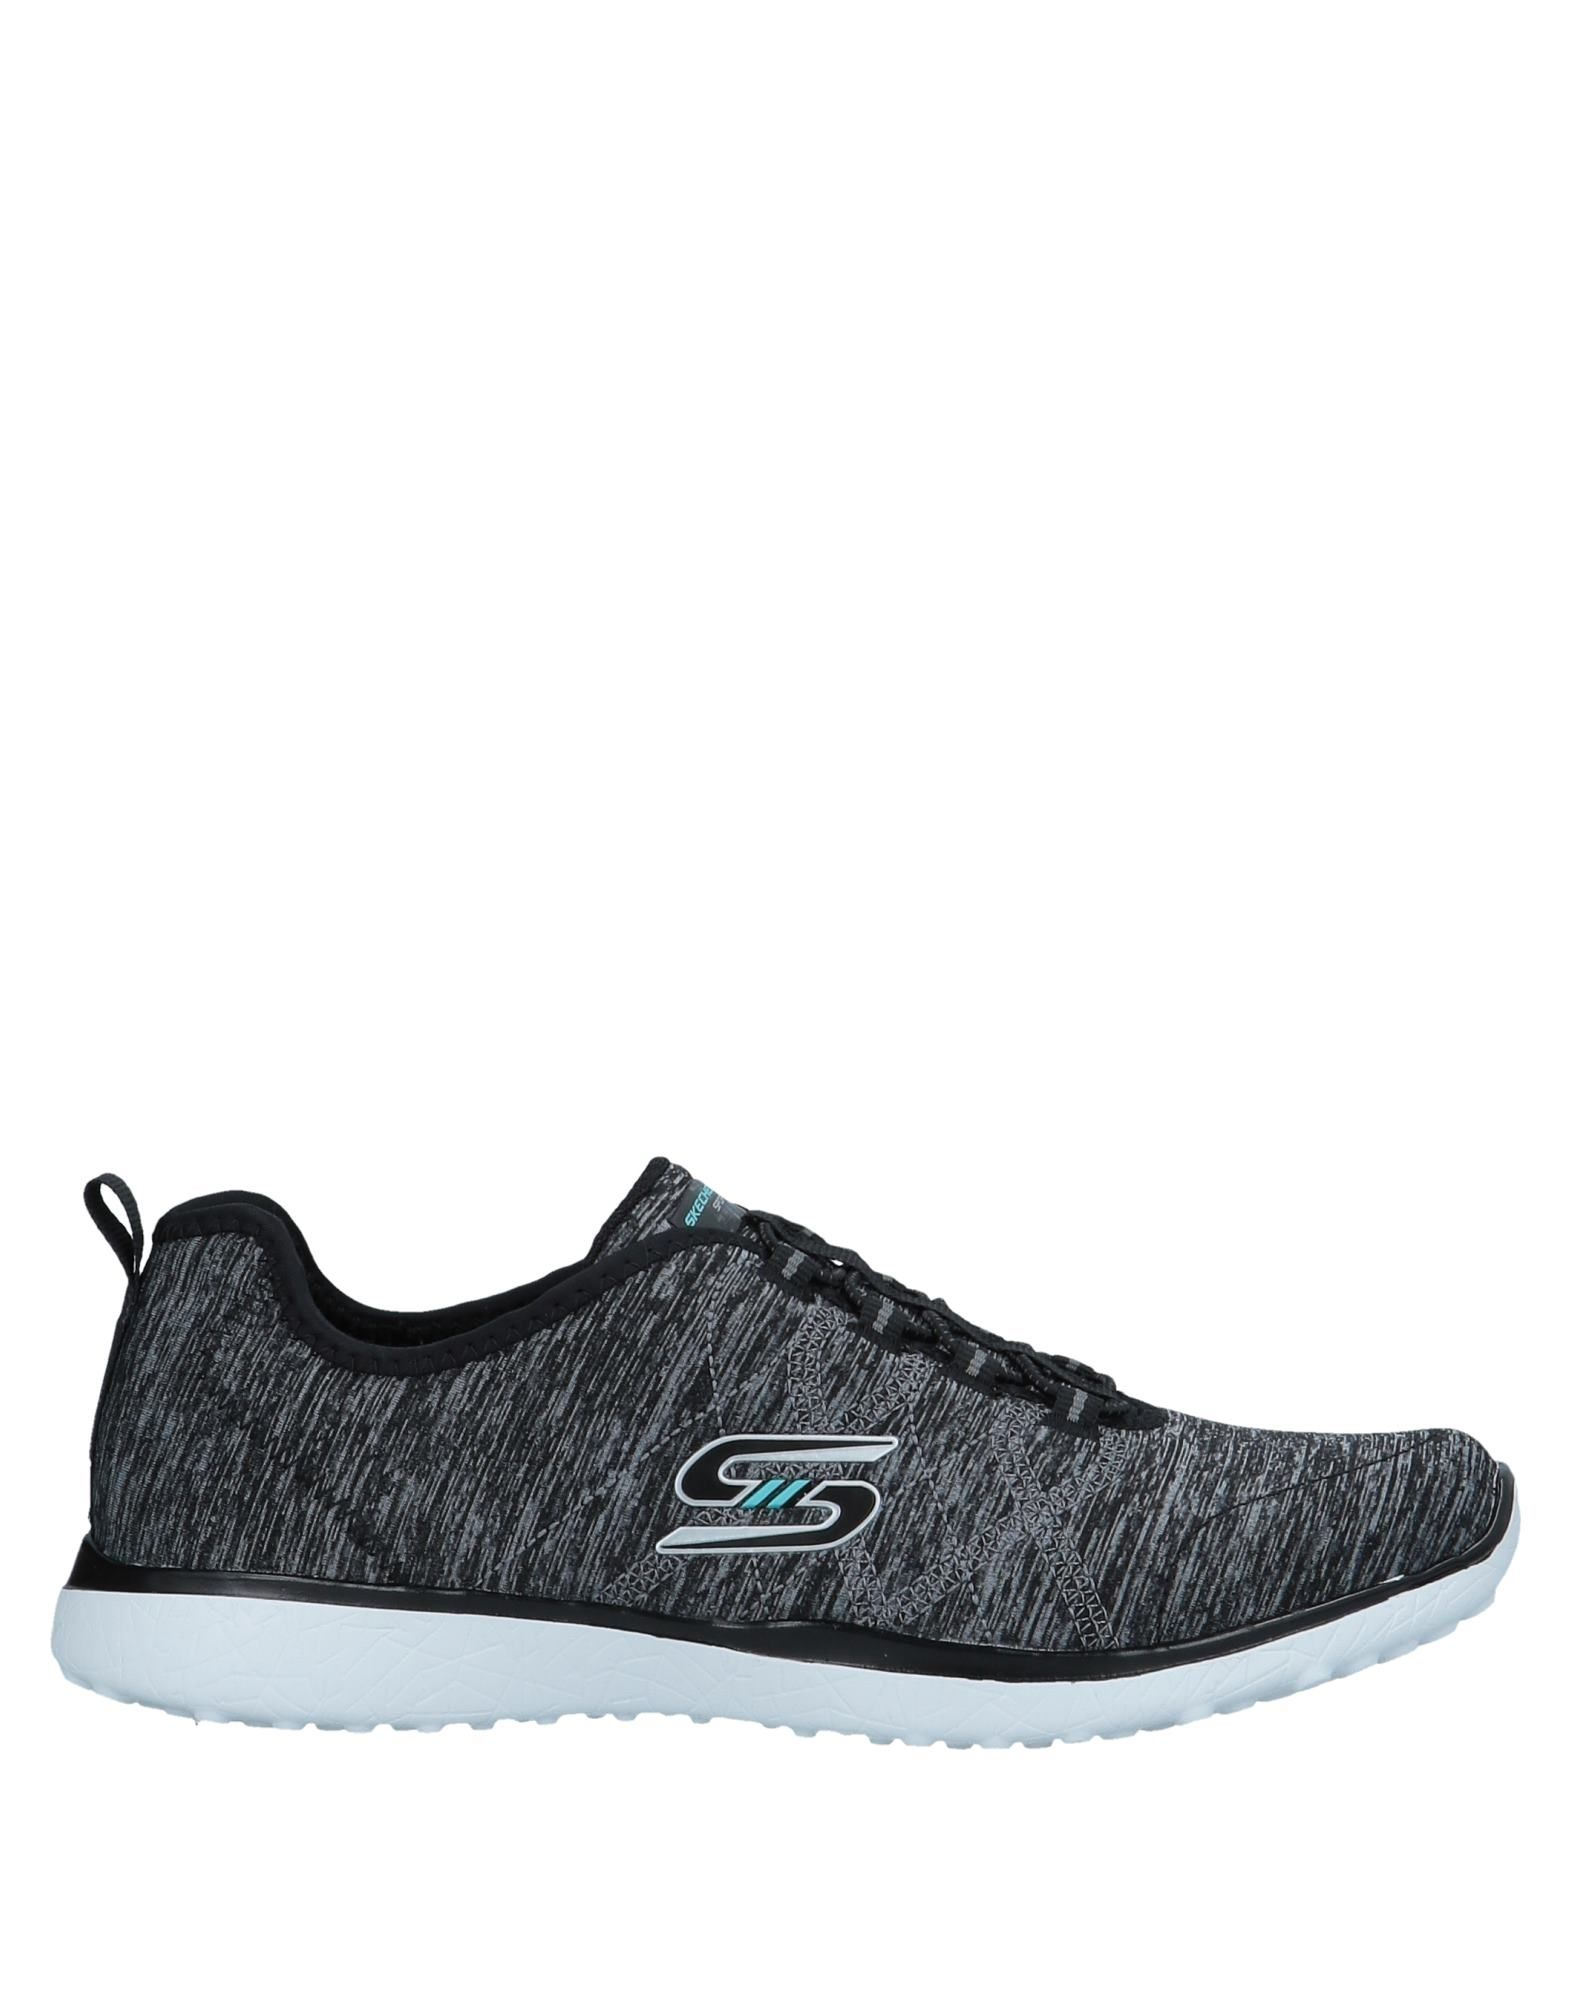 Skechers Sneakers Damen Damen Sneakers  11554743WA  59c103